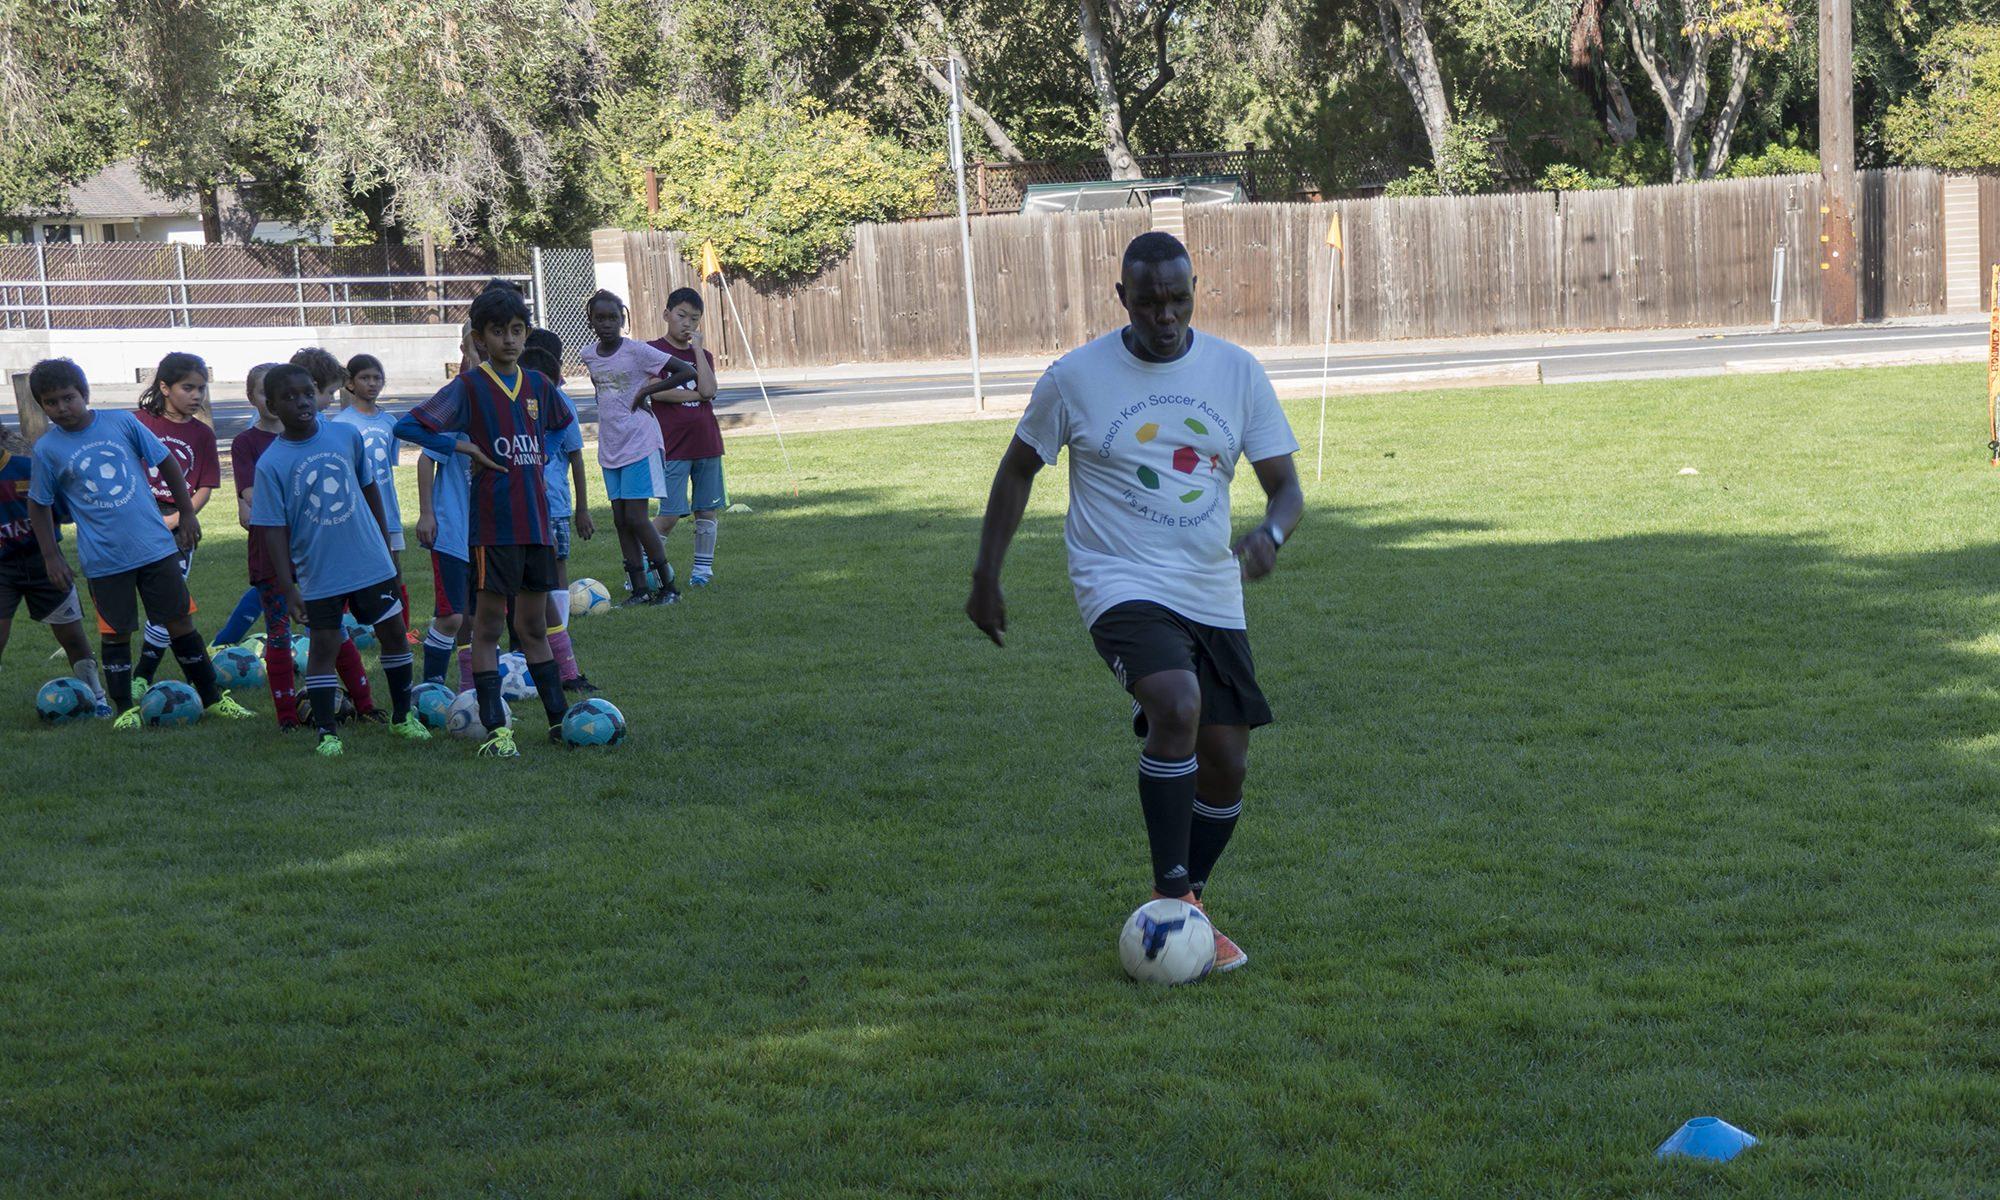 Coach Ken Soccer Academy